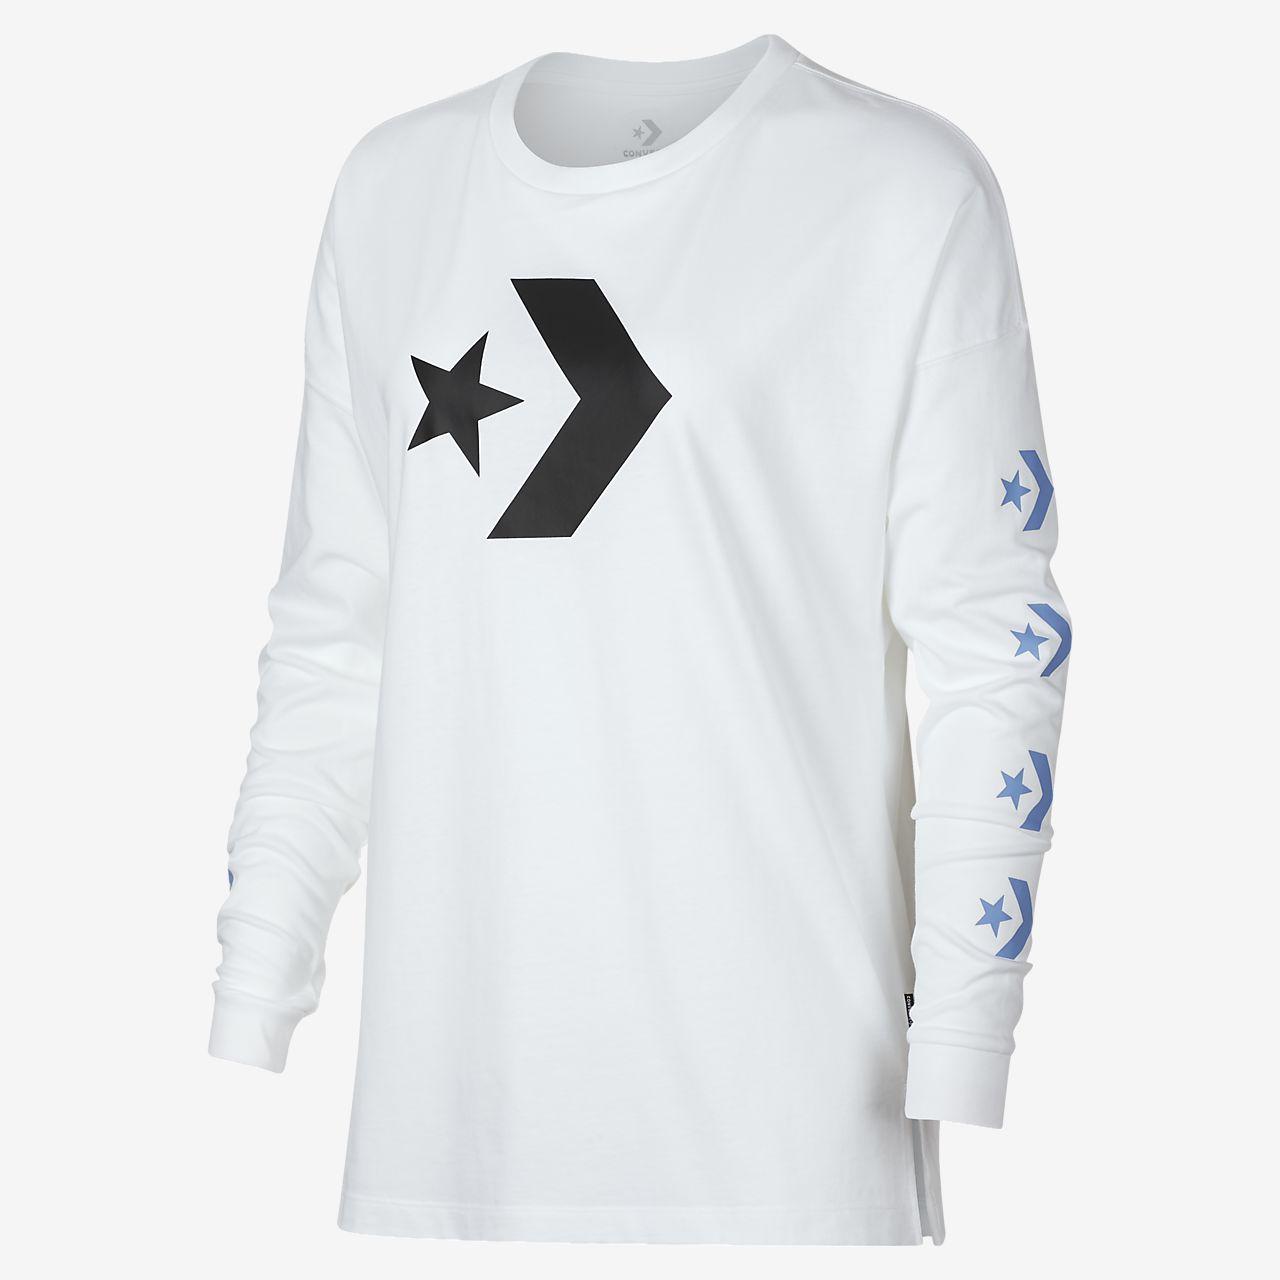 Converse Star Chevron Women's Long Sleeve T-Shirt